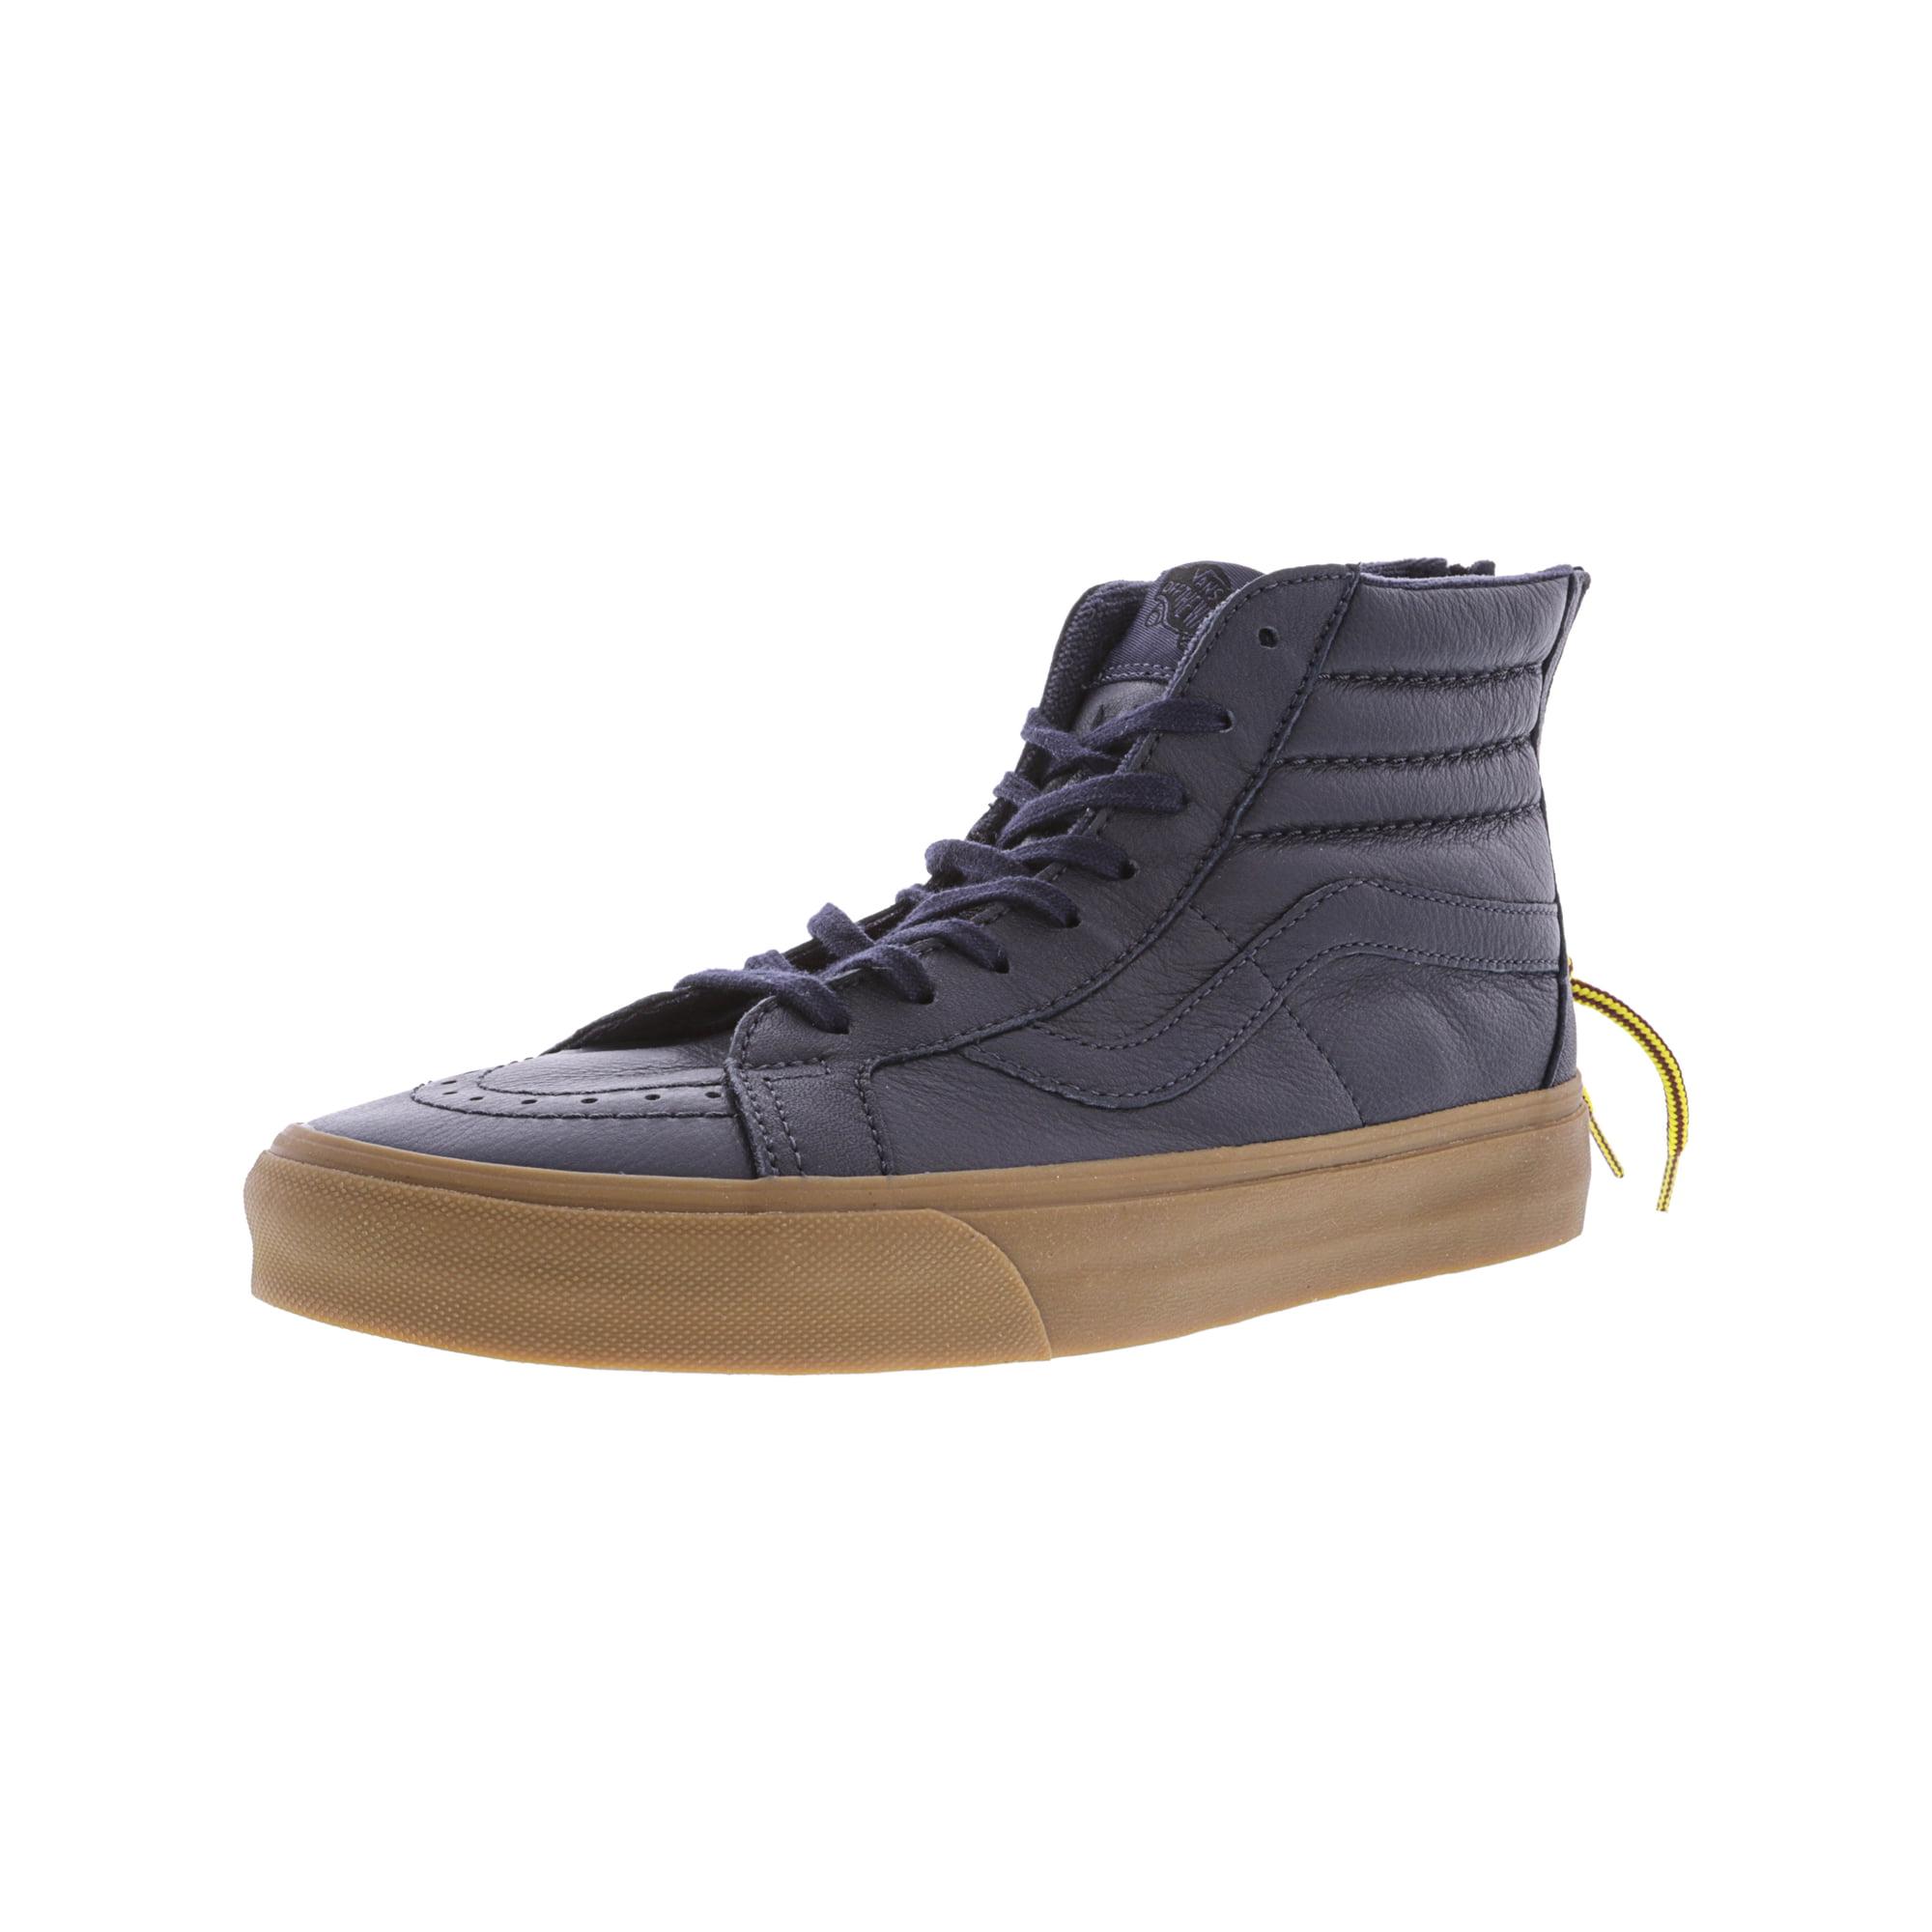 42598440798800 Vans Sk8-Hi Reissue Zip Hiking Navy   Gum Ankle-High Skateboarding Shoe -  9.5M 8M